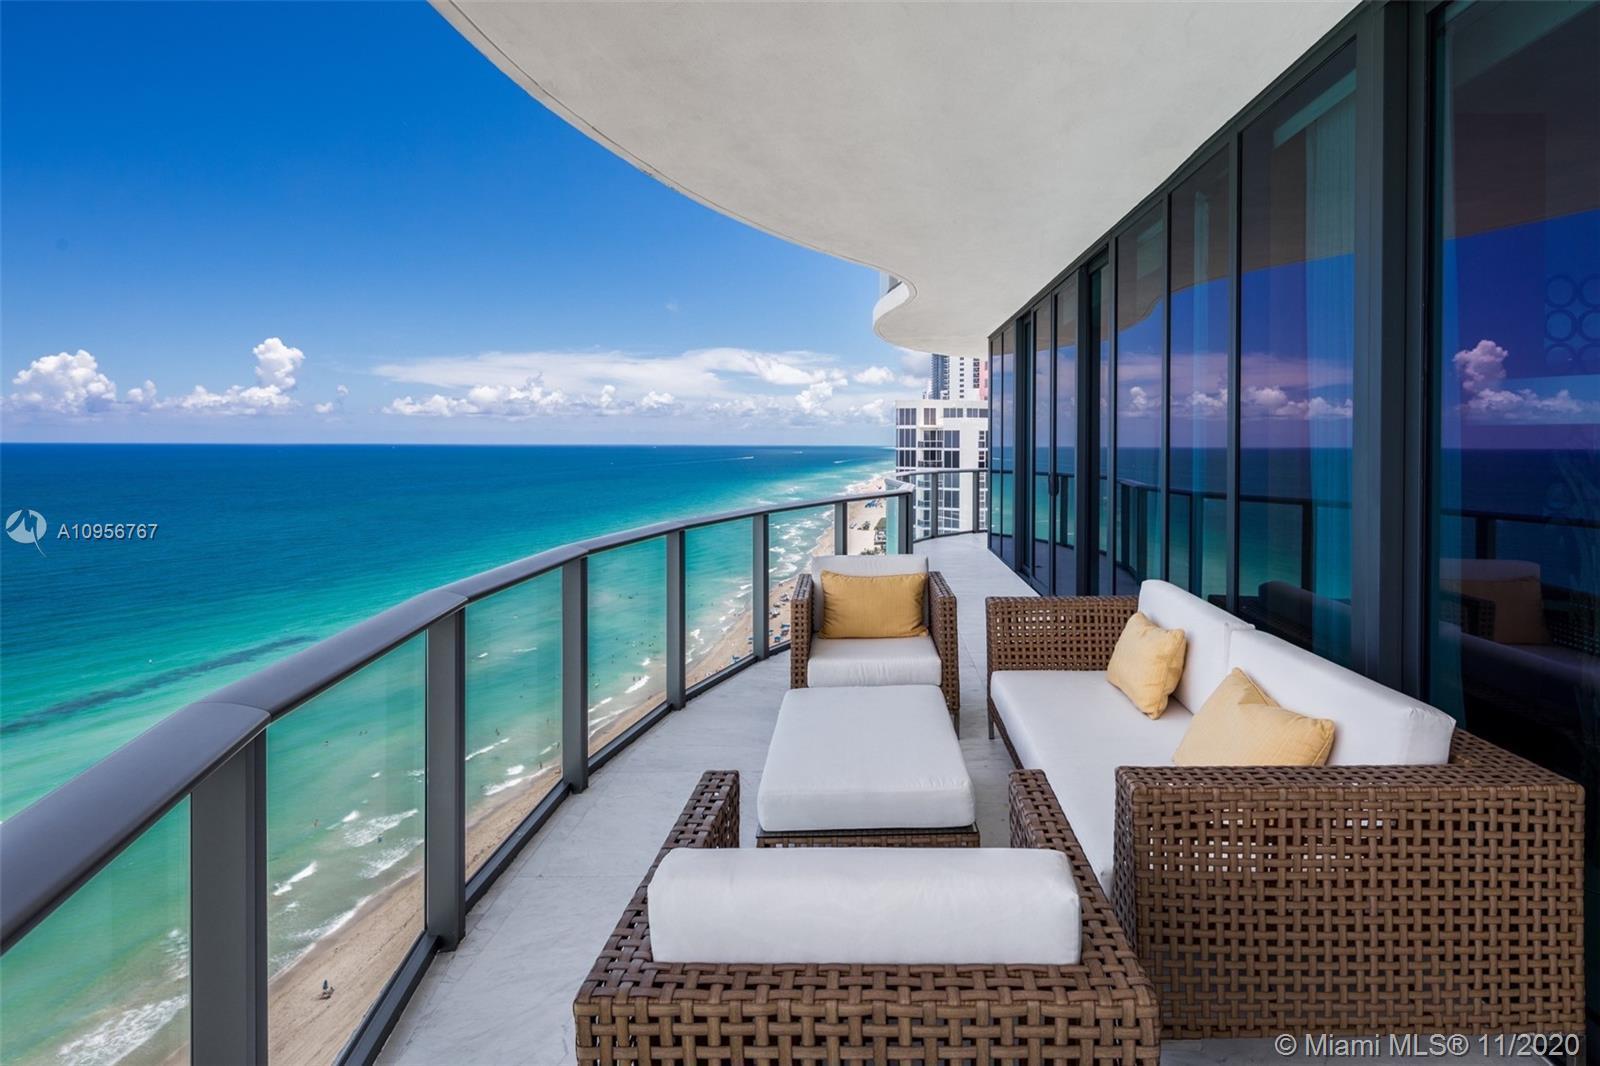 Tastefully designed by Tiza Kann & Carman Mansor, this full floor 5,515 Sqft luxury unit at the Rega